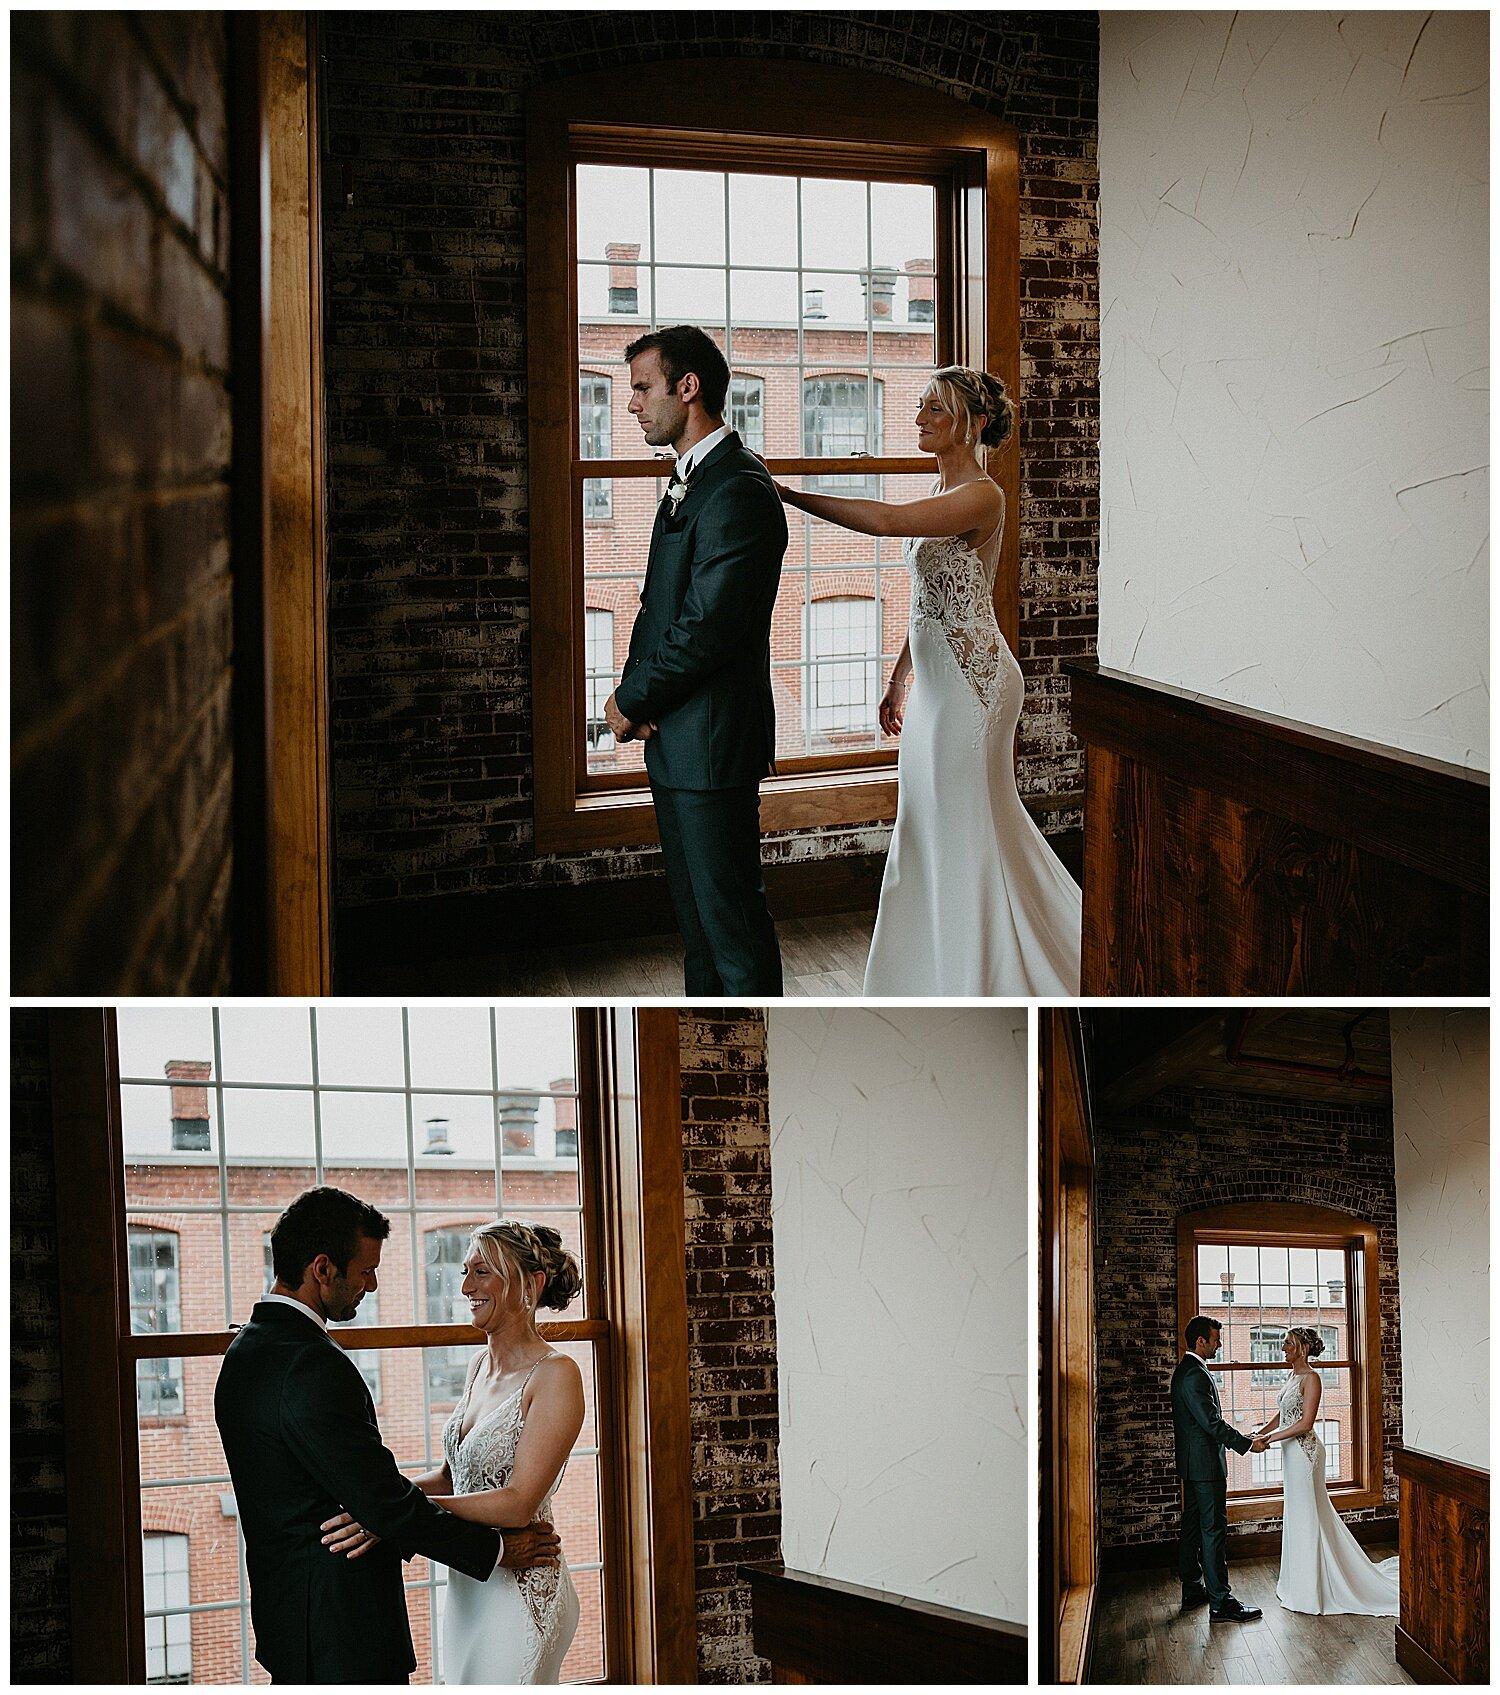 NEPA-Lewisburg-Wedding-Photographer-at-the-Rusty-Rail_0003.jpg